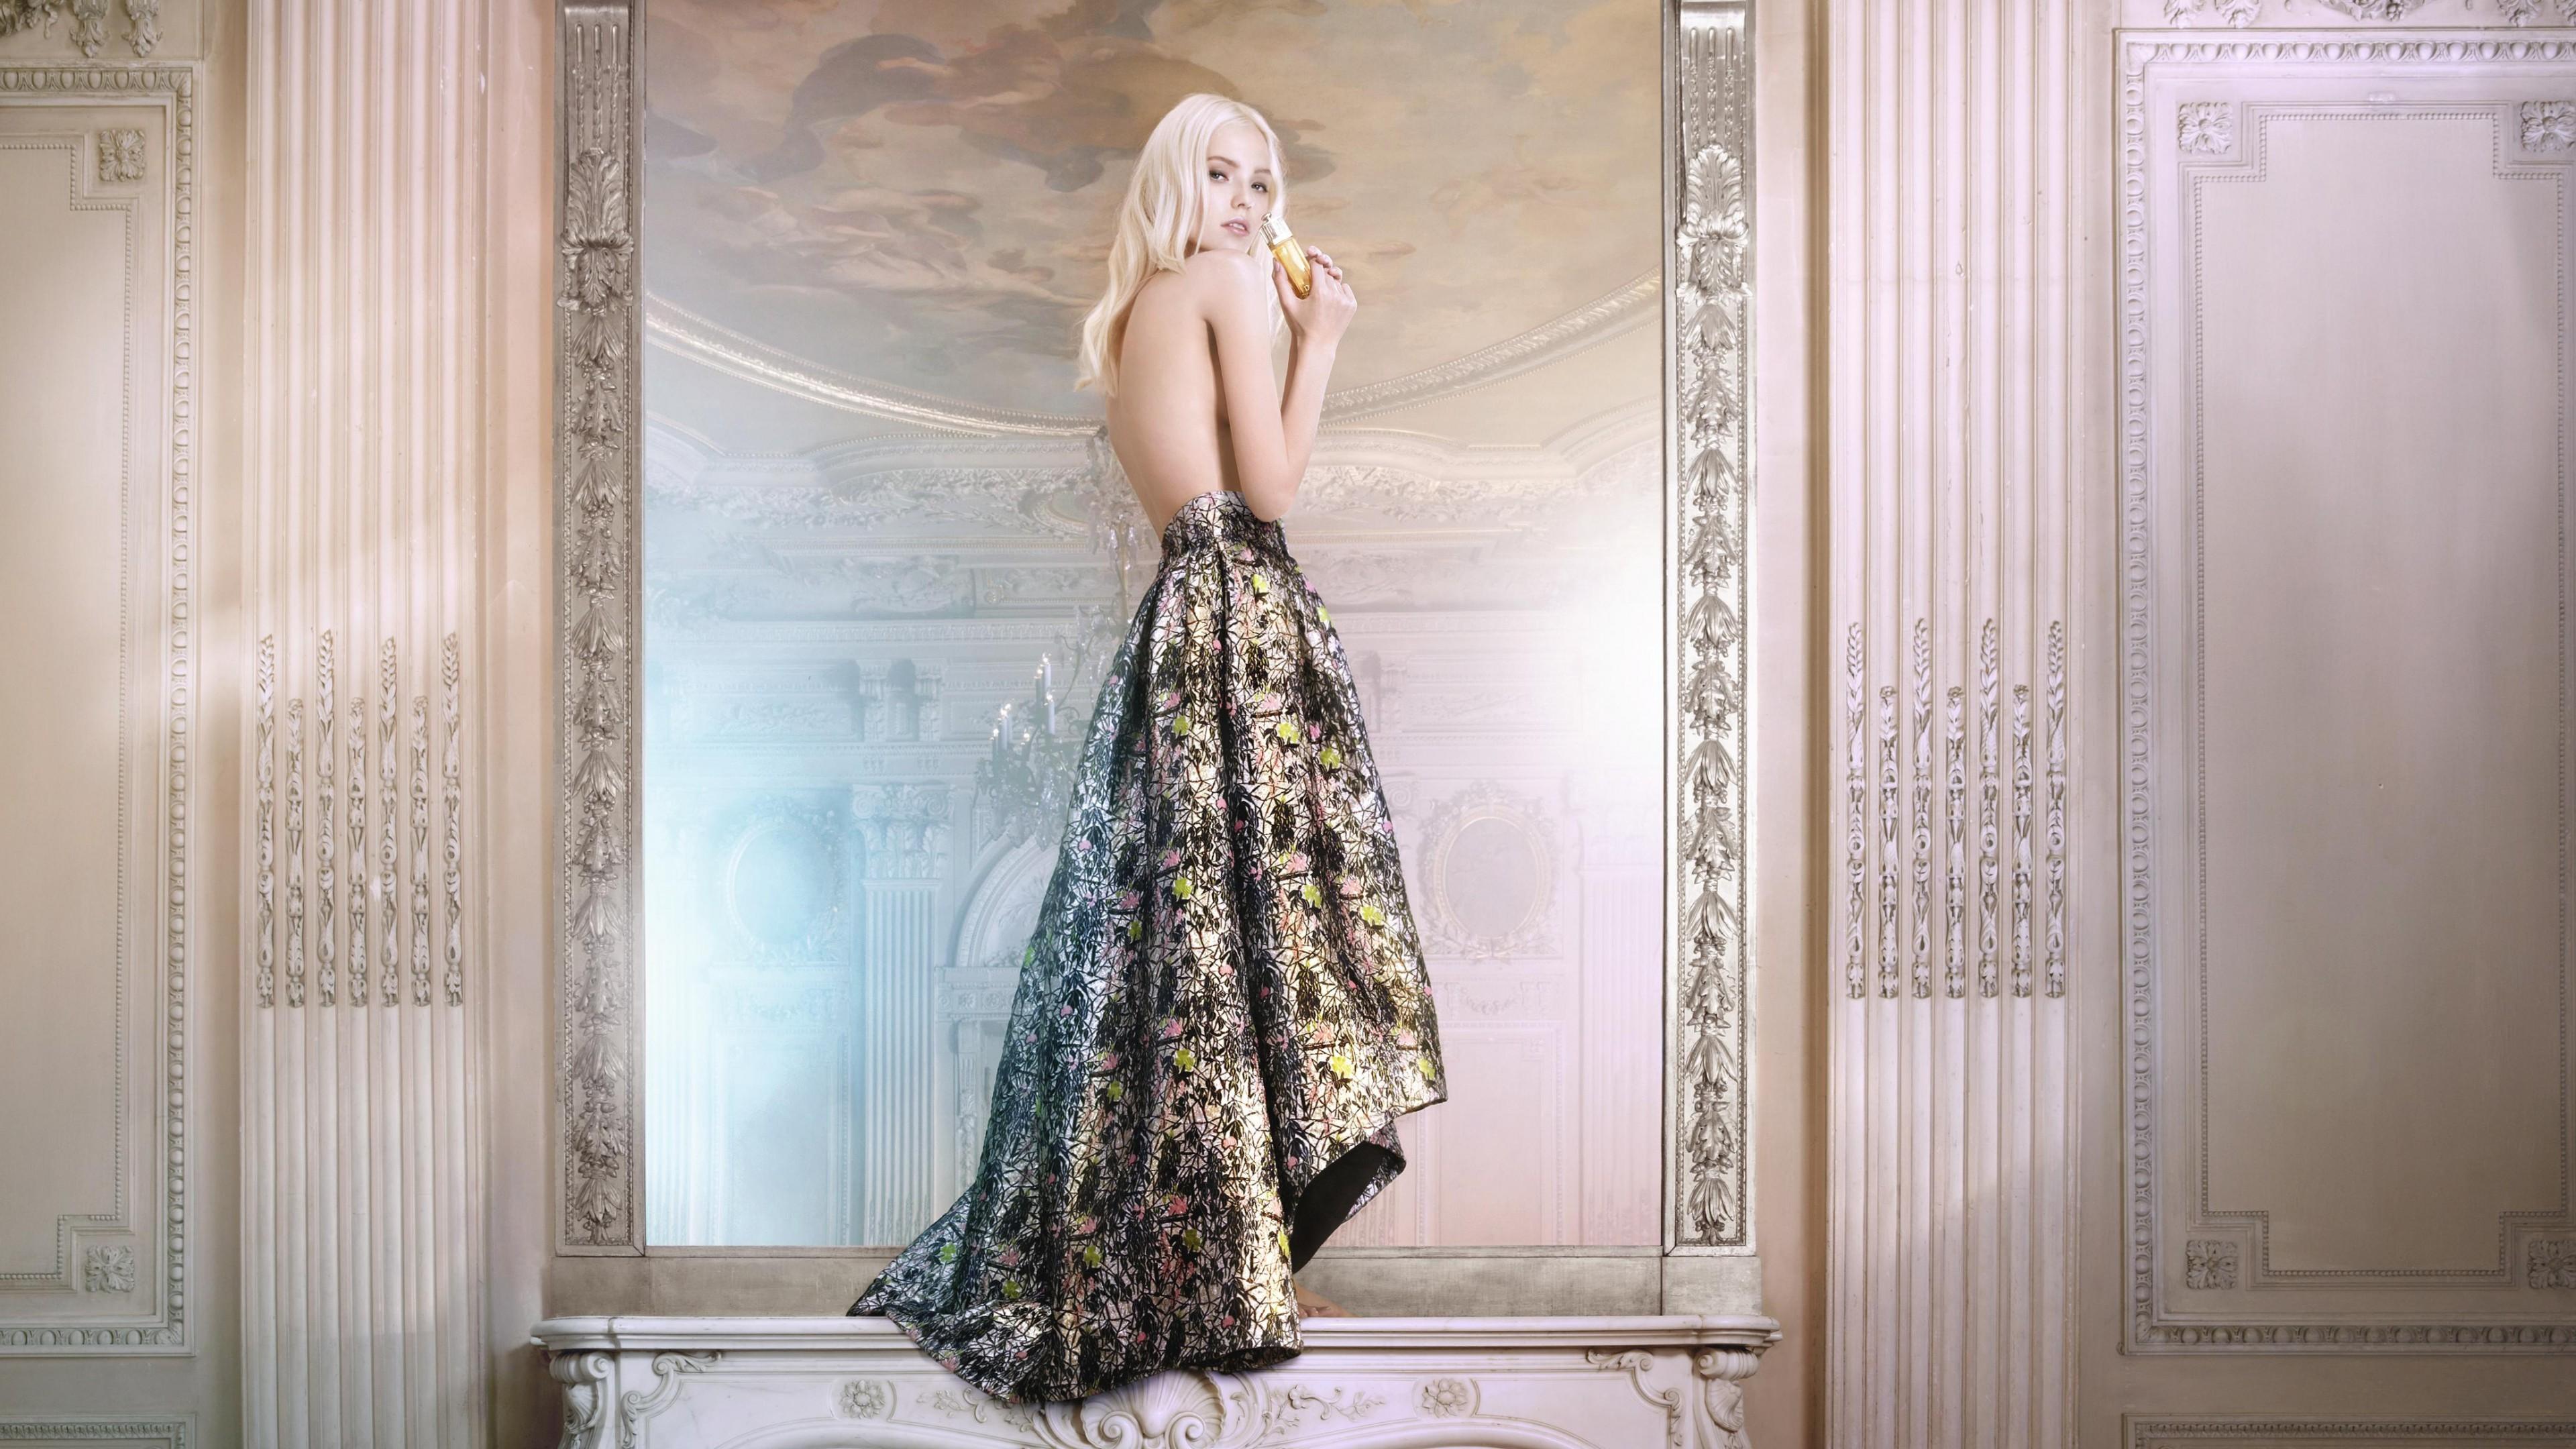 Wallpaper Sasha Luss Top Fashion Models 2015 Model